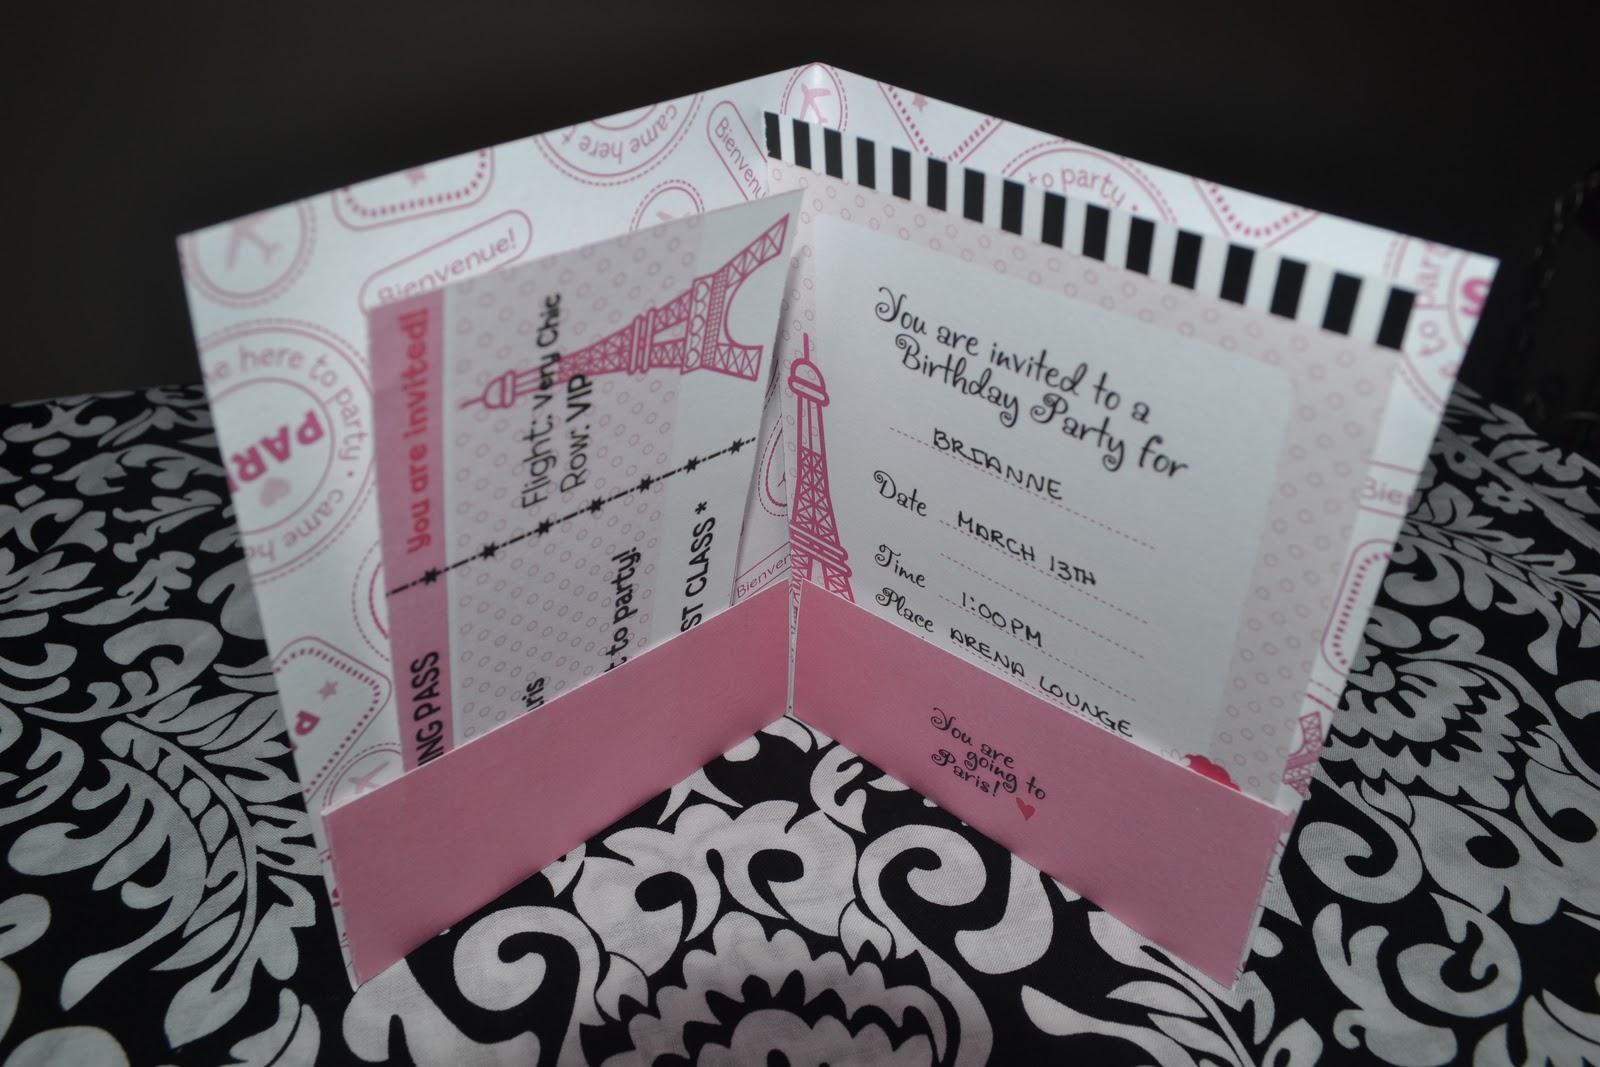 Passport Themed Invitations is perfect invitation ideas